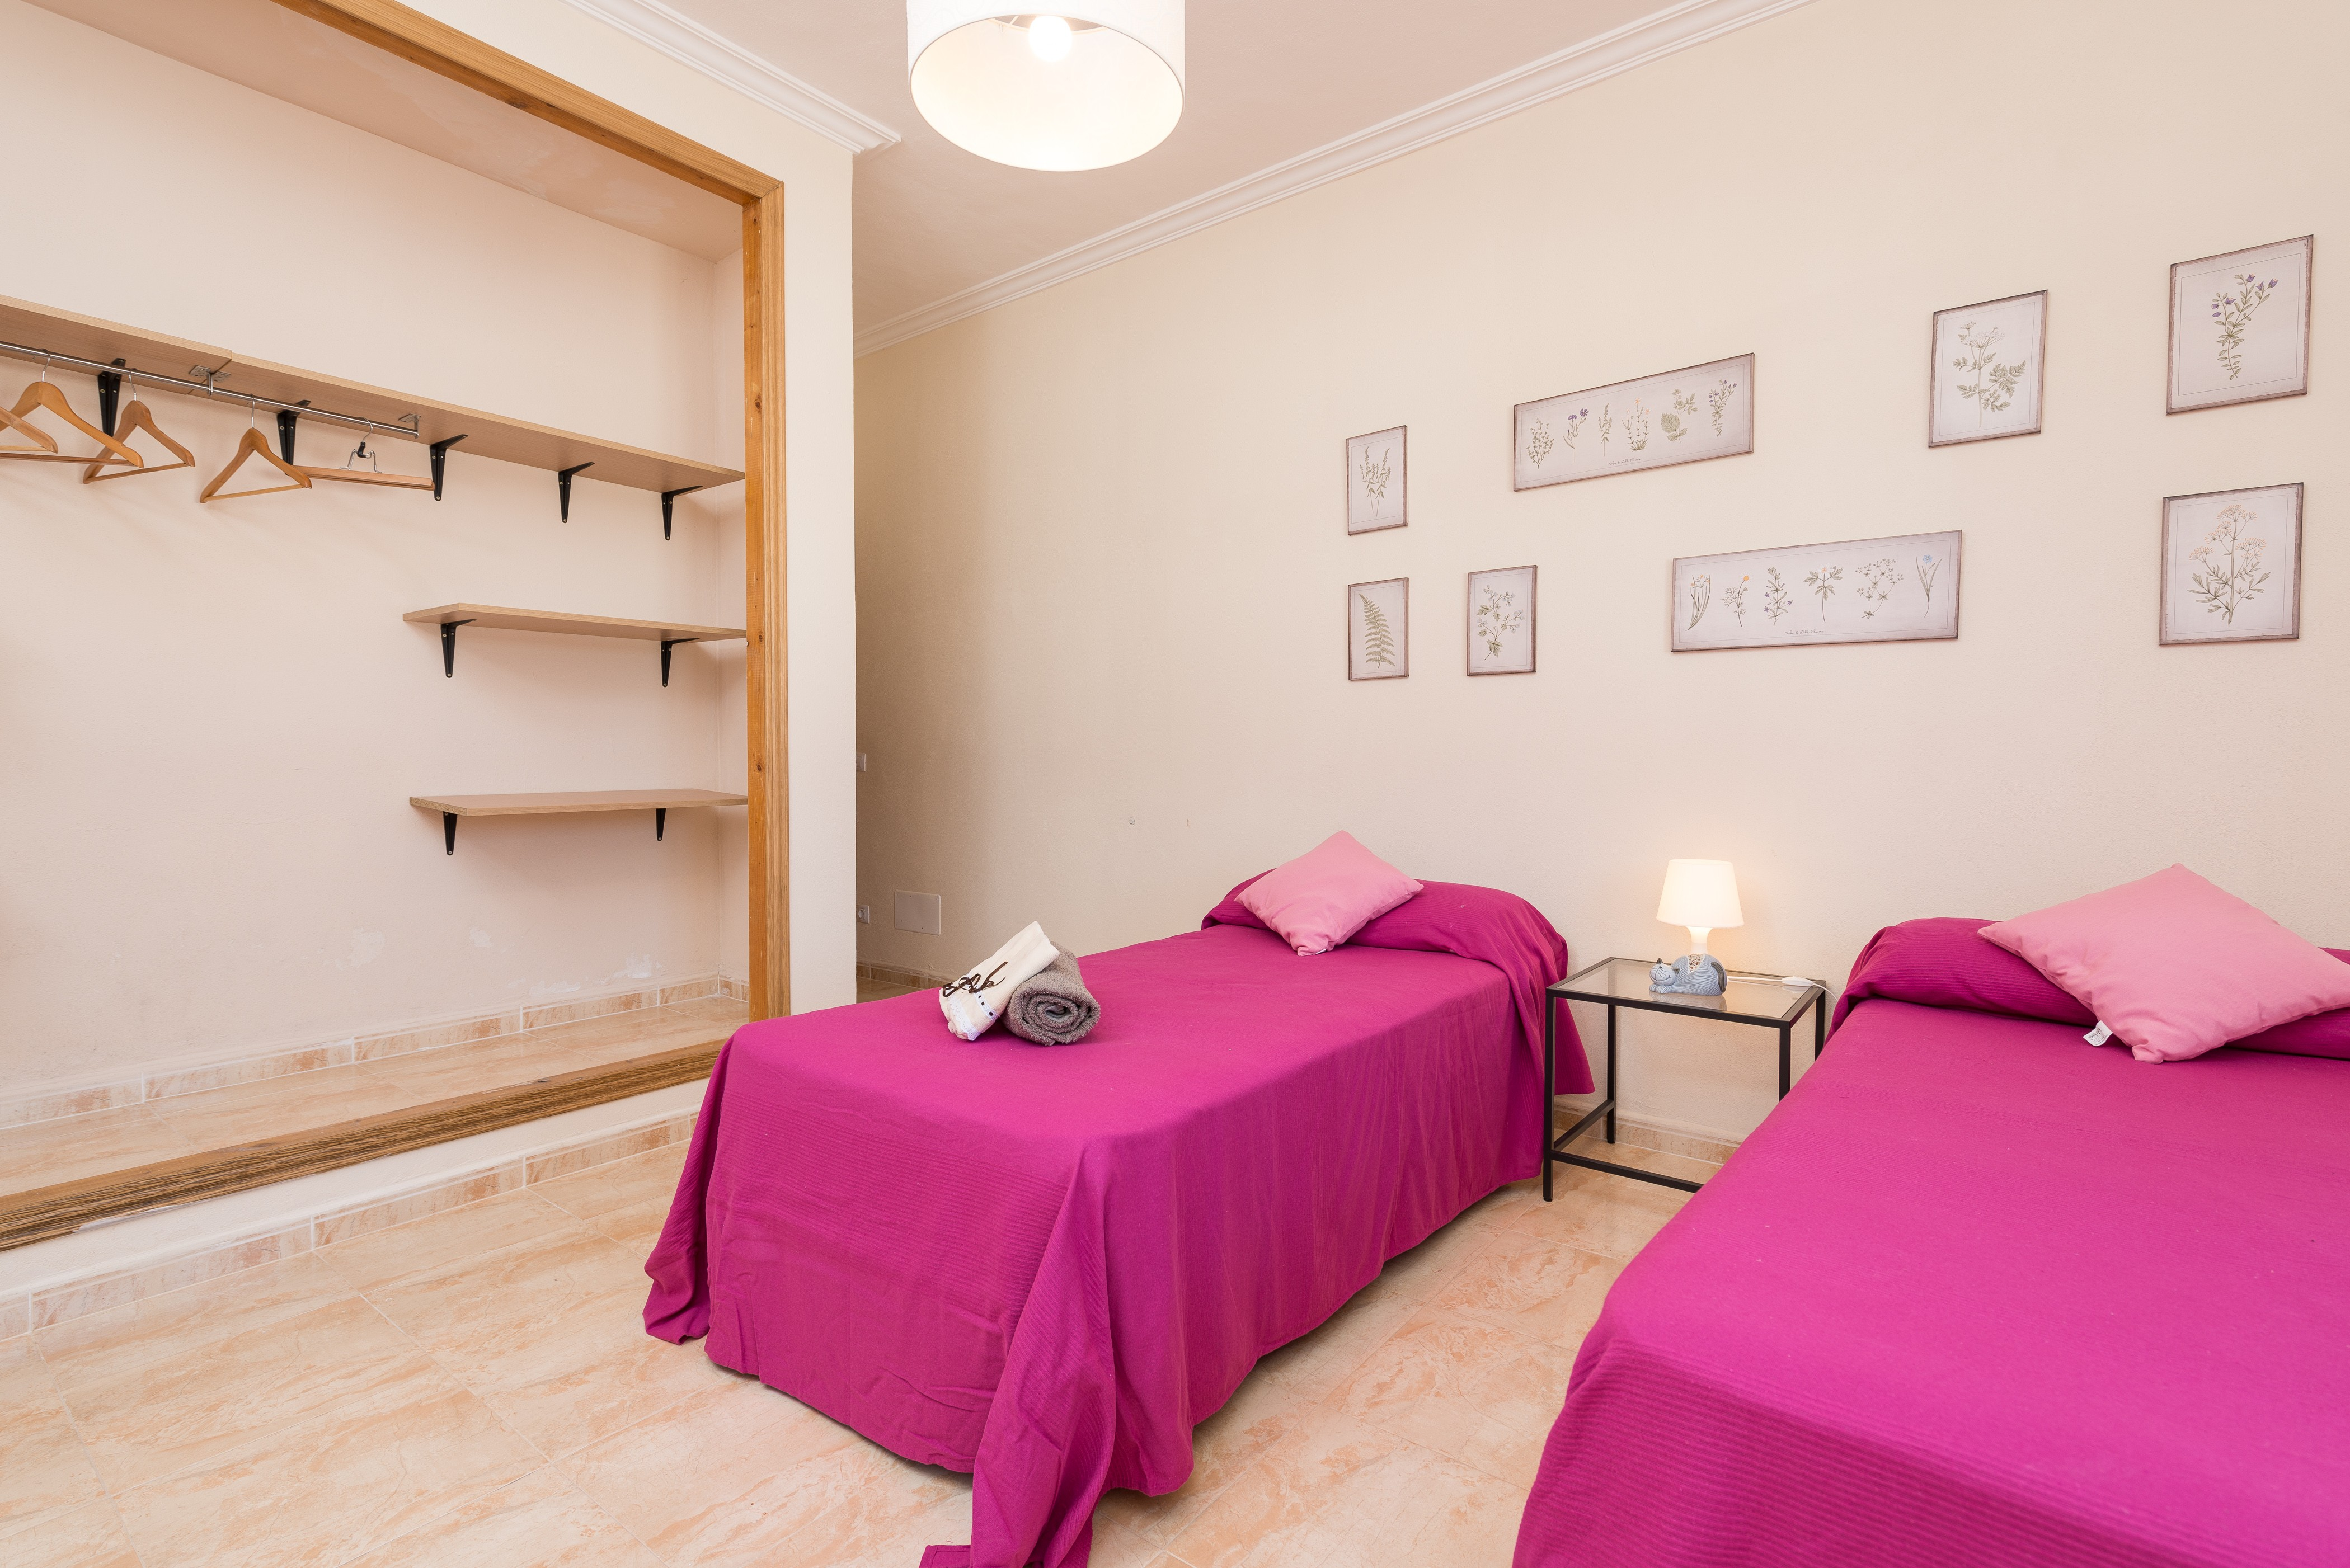 Ferienhaus CAN MOLINA (2063640), Cala Mandia, Mallorca, Balearische Inseln, Spanien, Bild 31